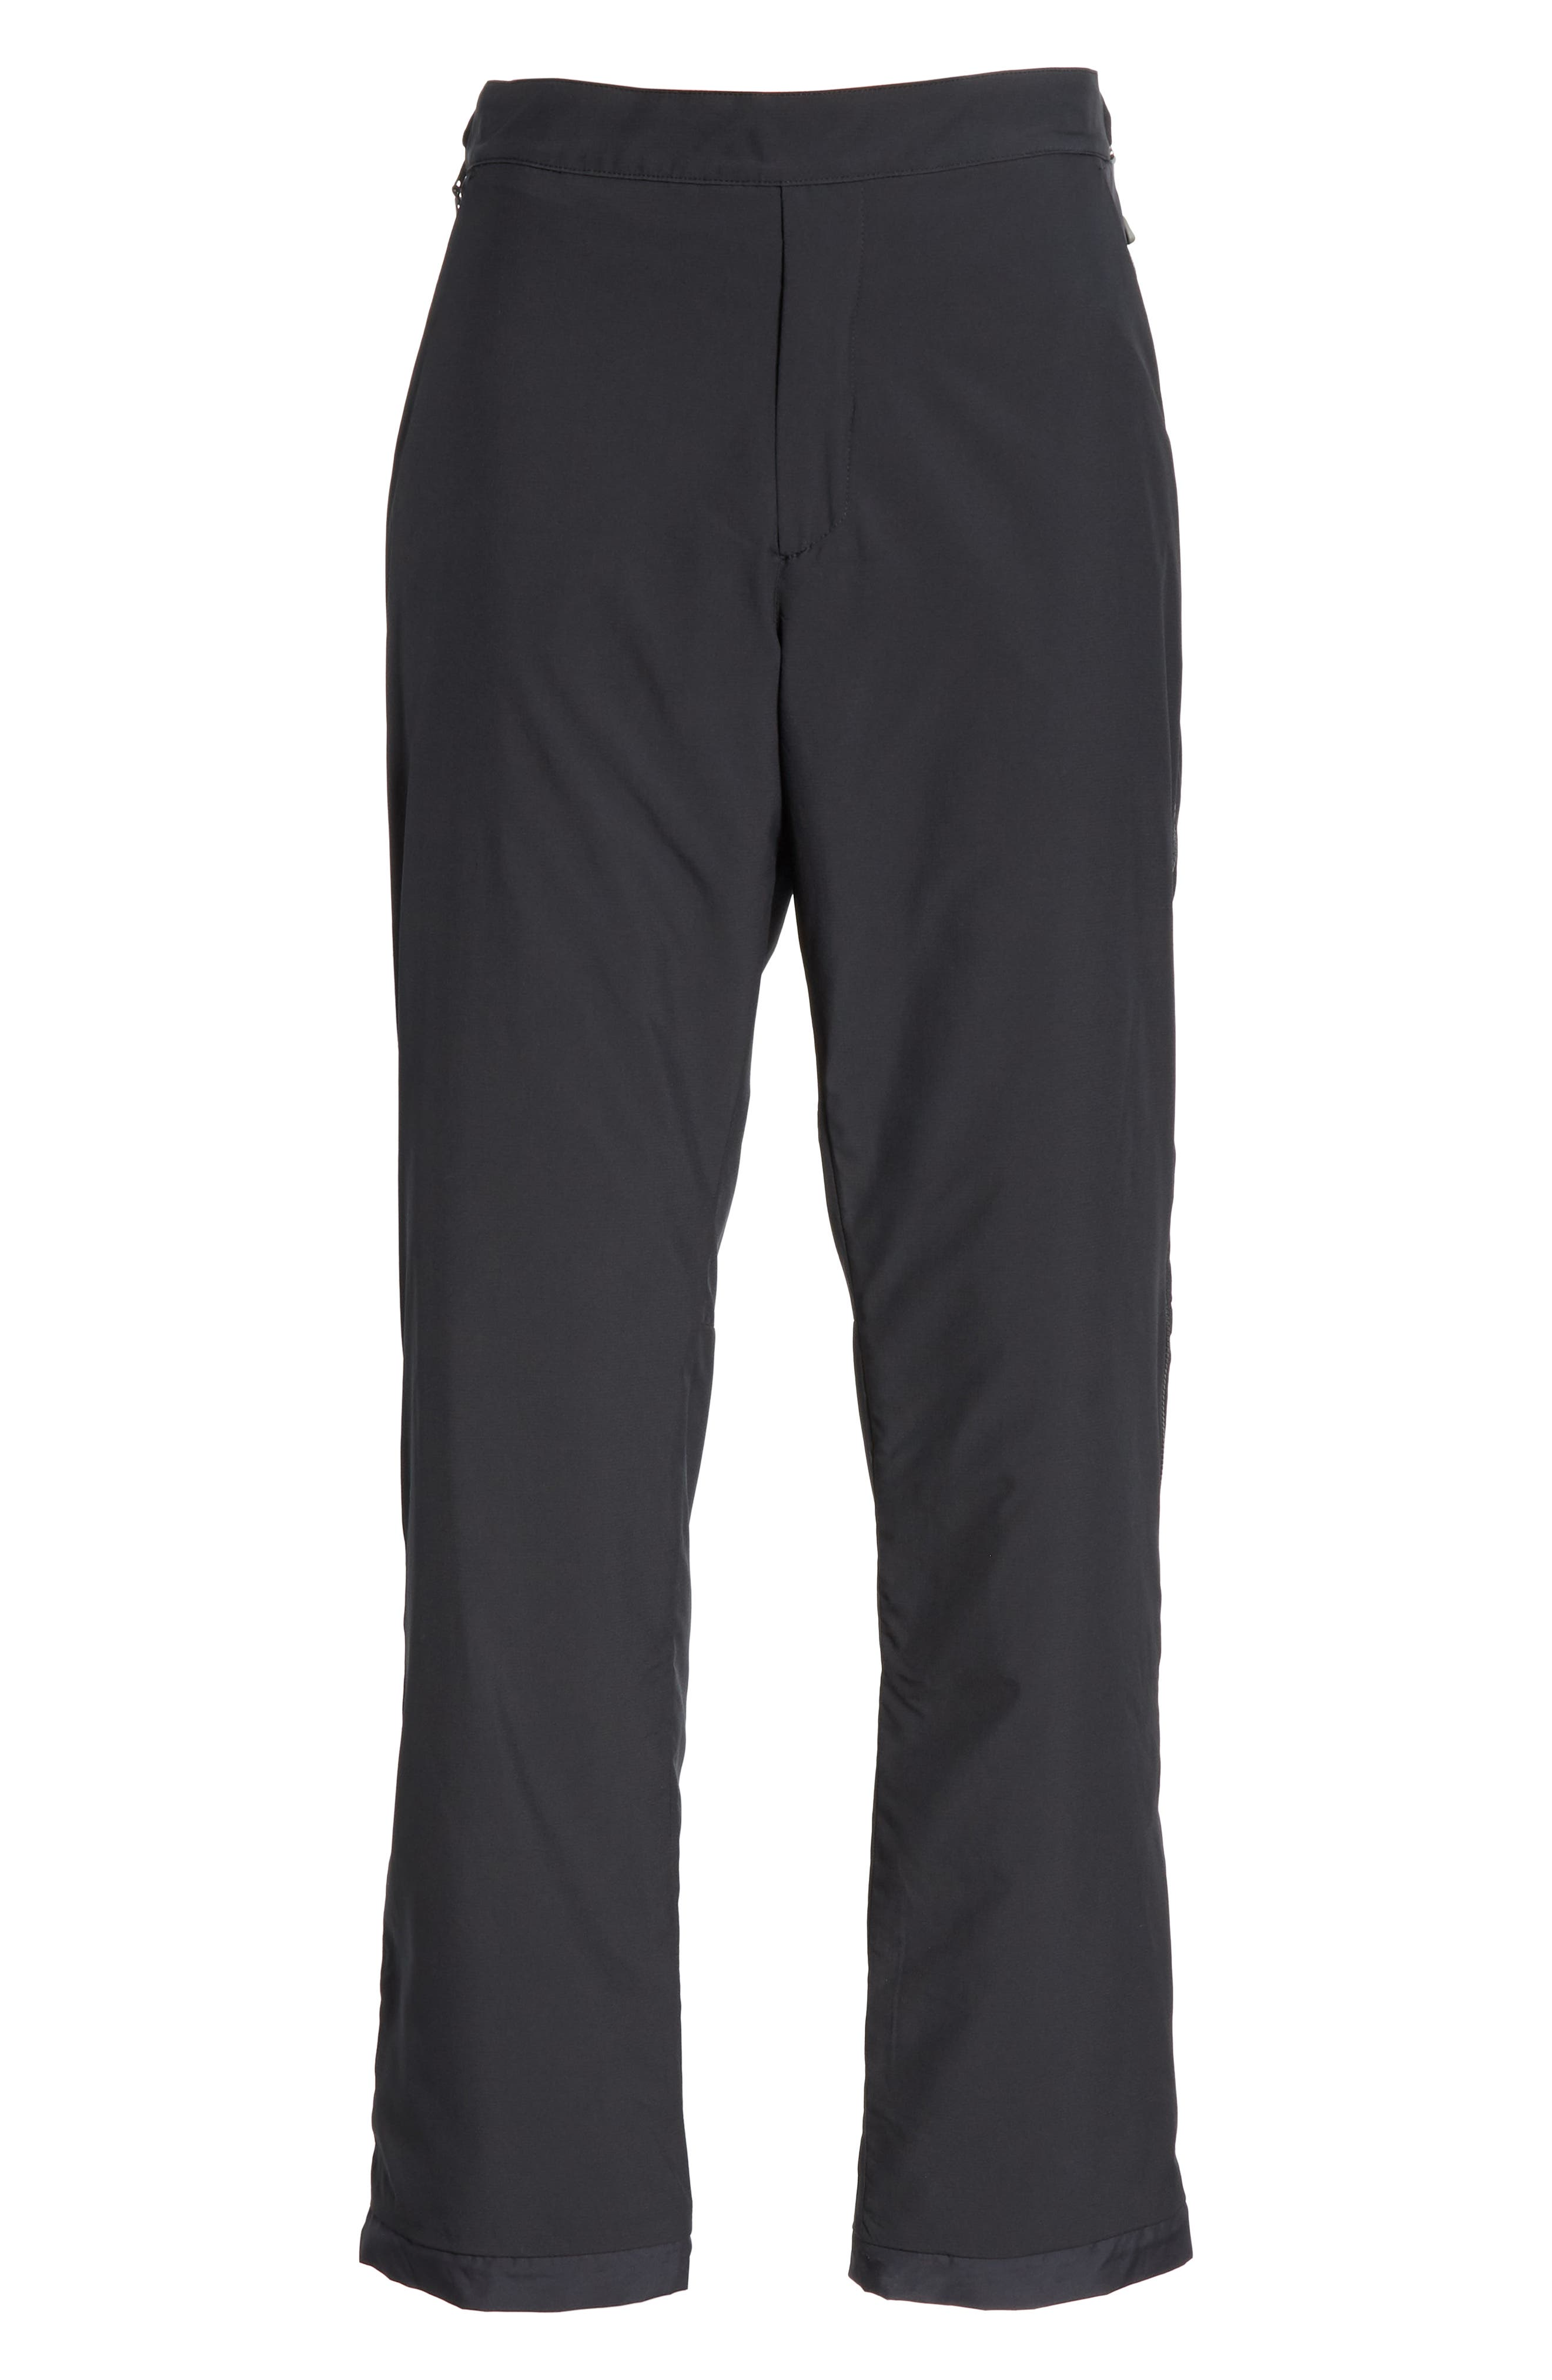 HOUDINI, Ci Insulated Men's Pants, Main thumbnail 1, color, 001